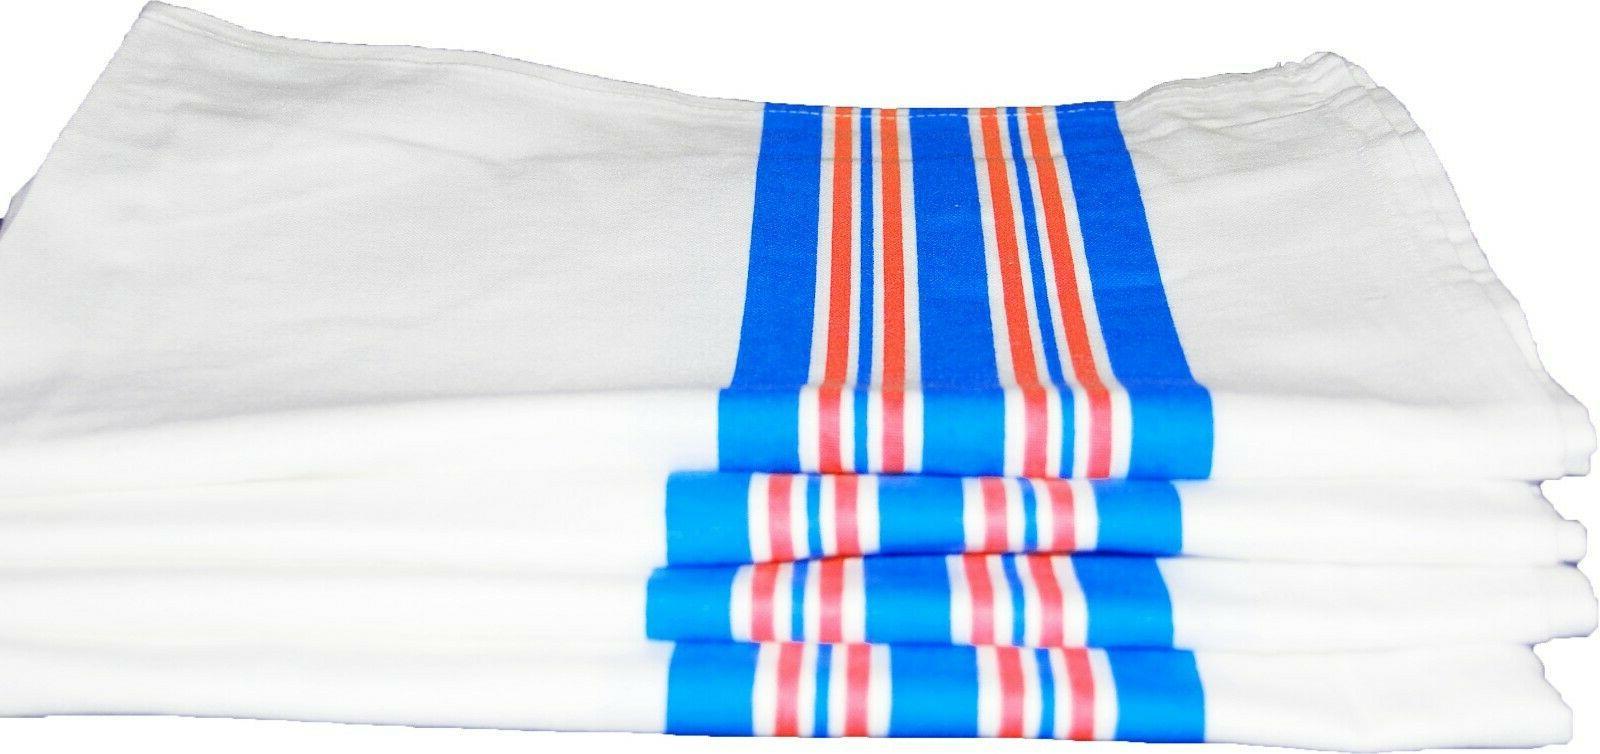 6- Baby-Infant Receiving Swaddling Hospital Blanket Cotton